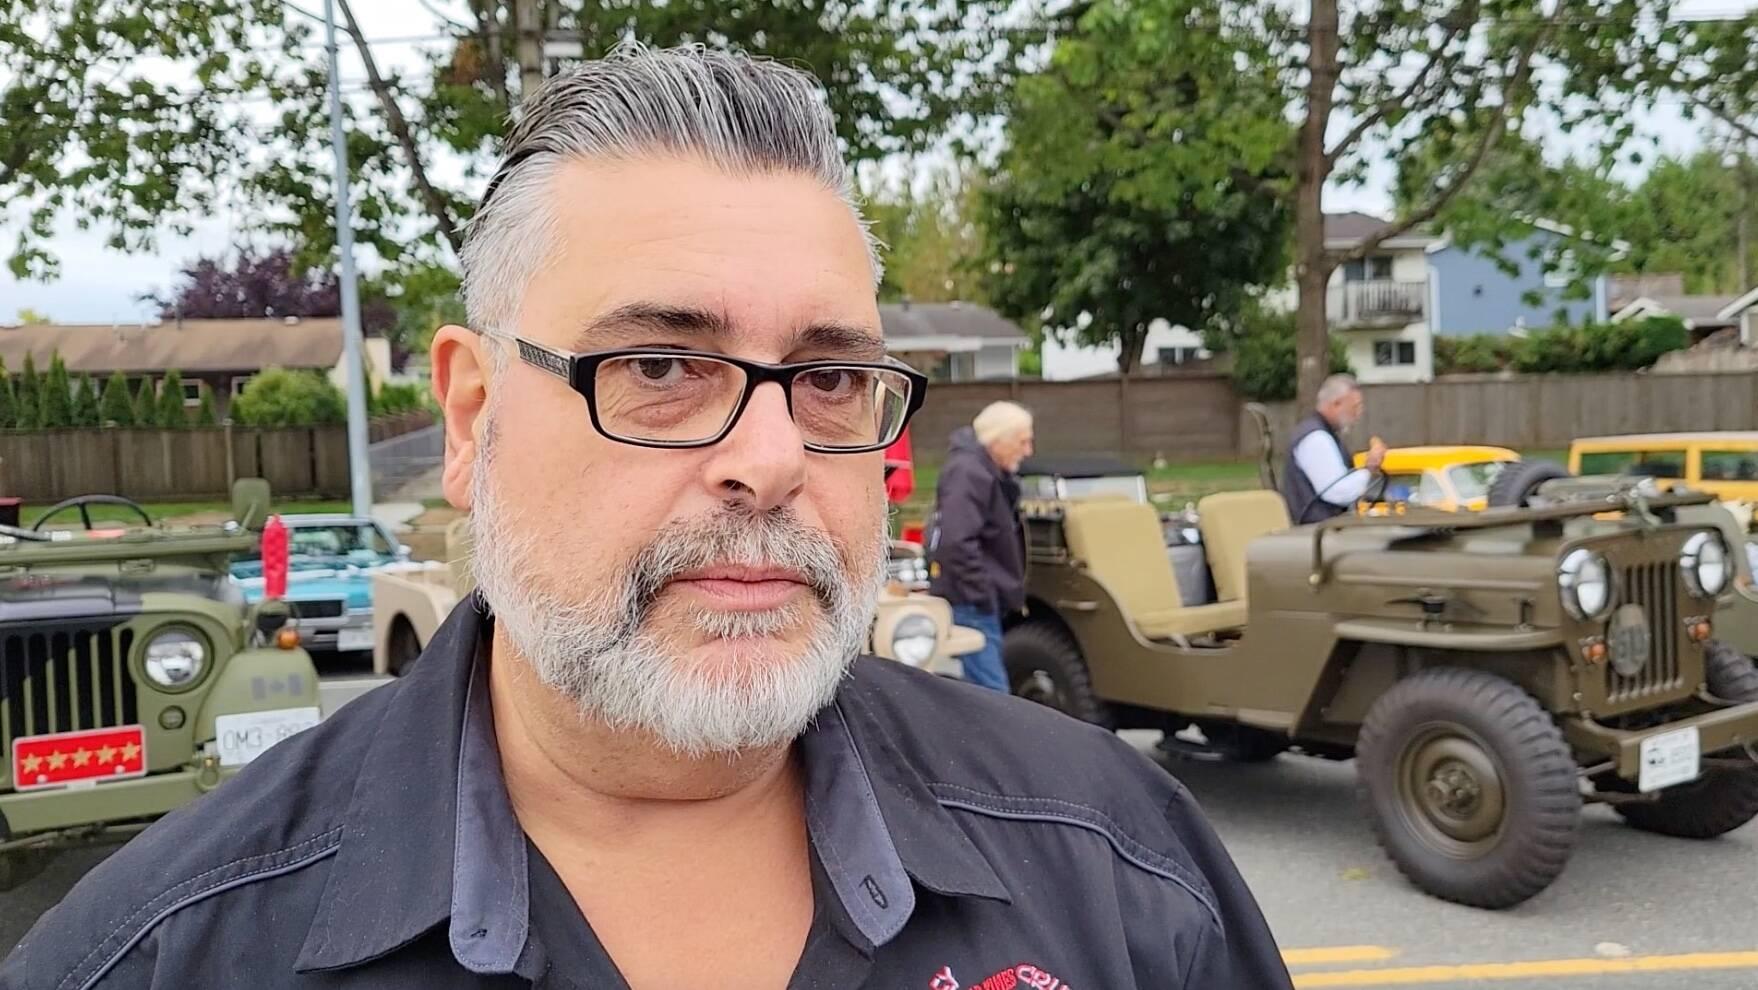 Car show president Riccardo Sestito revealed the Good Times Cruise-In in Aldergrove on Saturday, Sept. 11. wasn't a definite 'go' until a few days ago. (Dan Ferguson/Langley Advance Times)